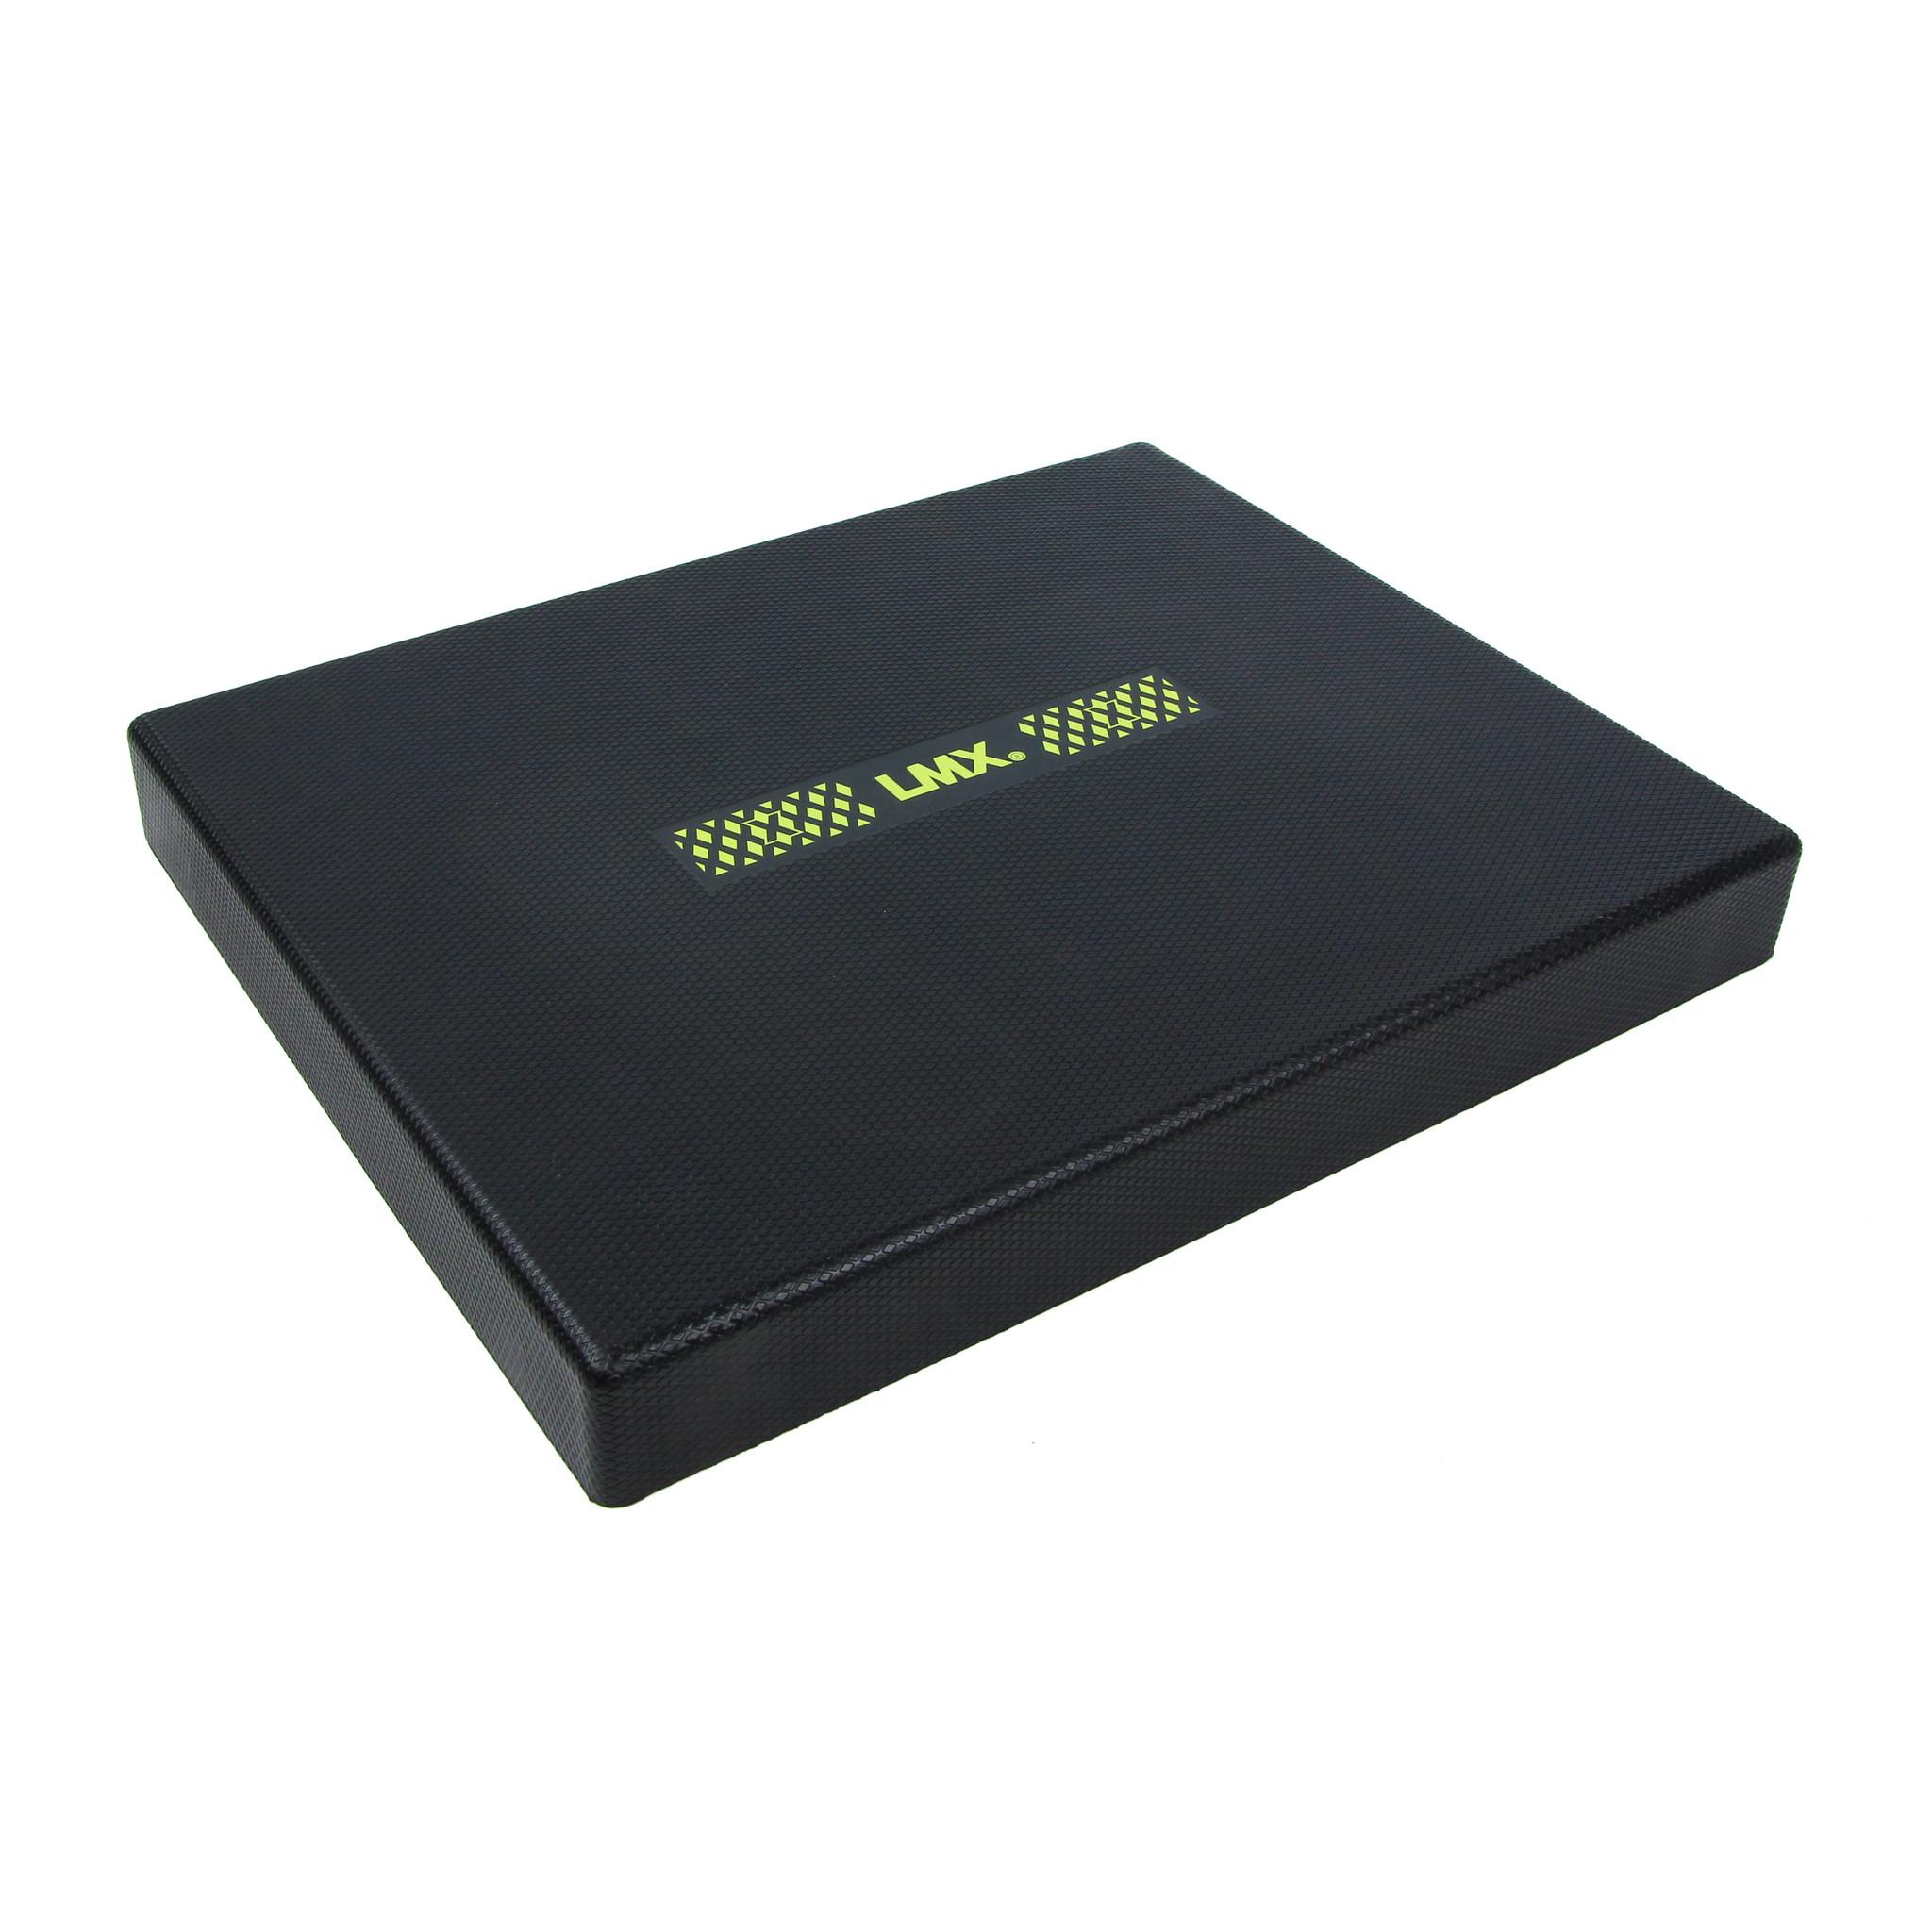 LMX.® LMX1606 LMX. Balance pad